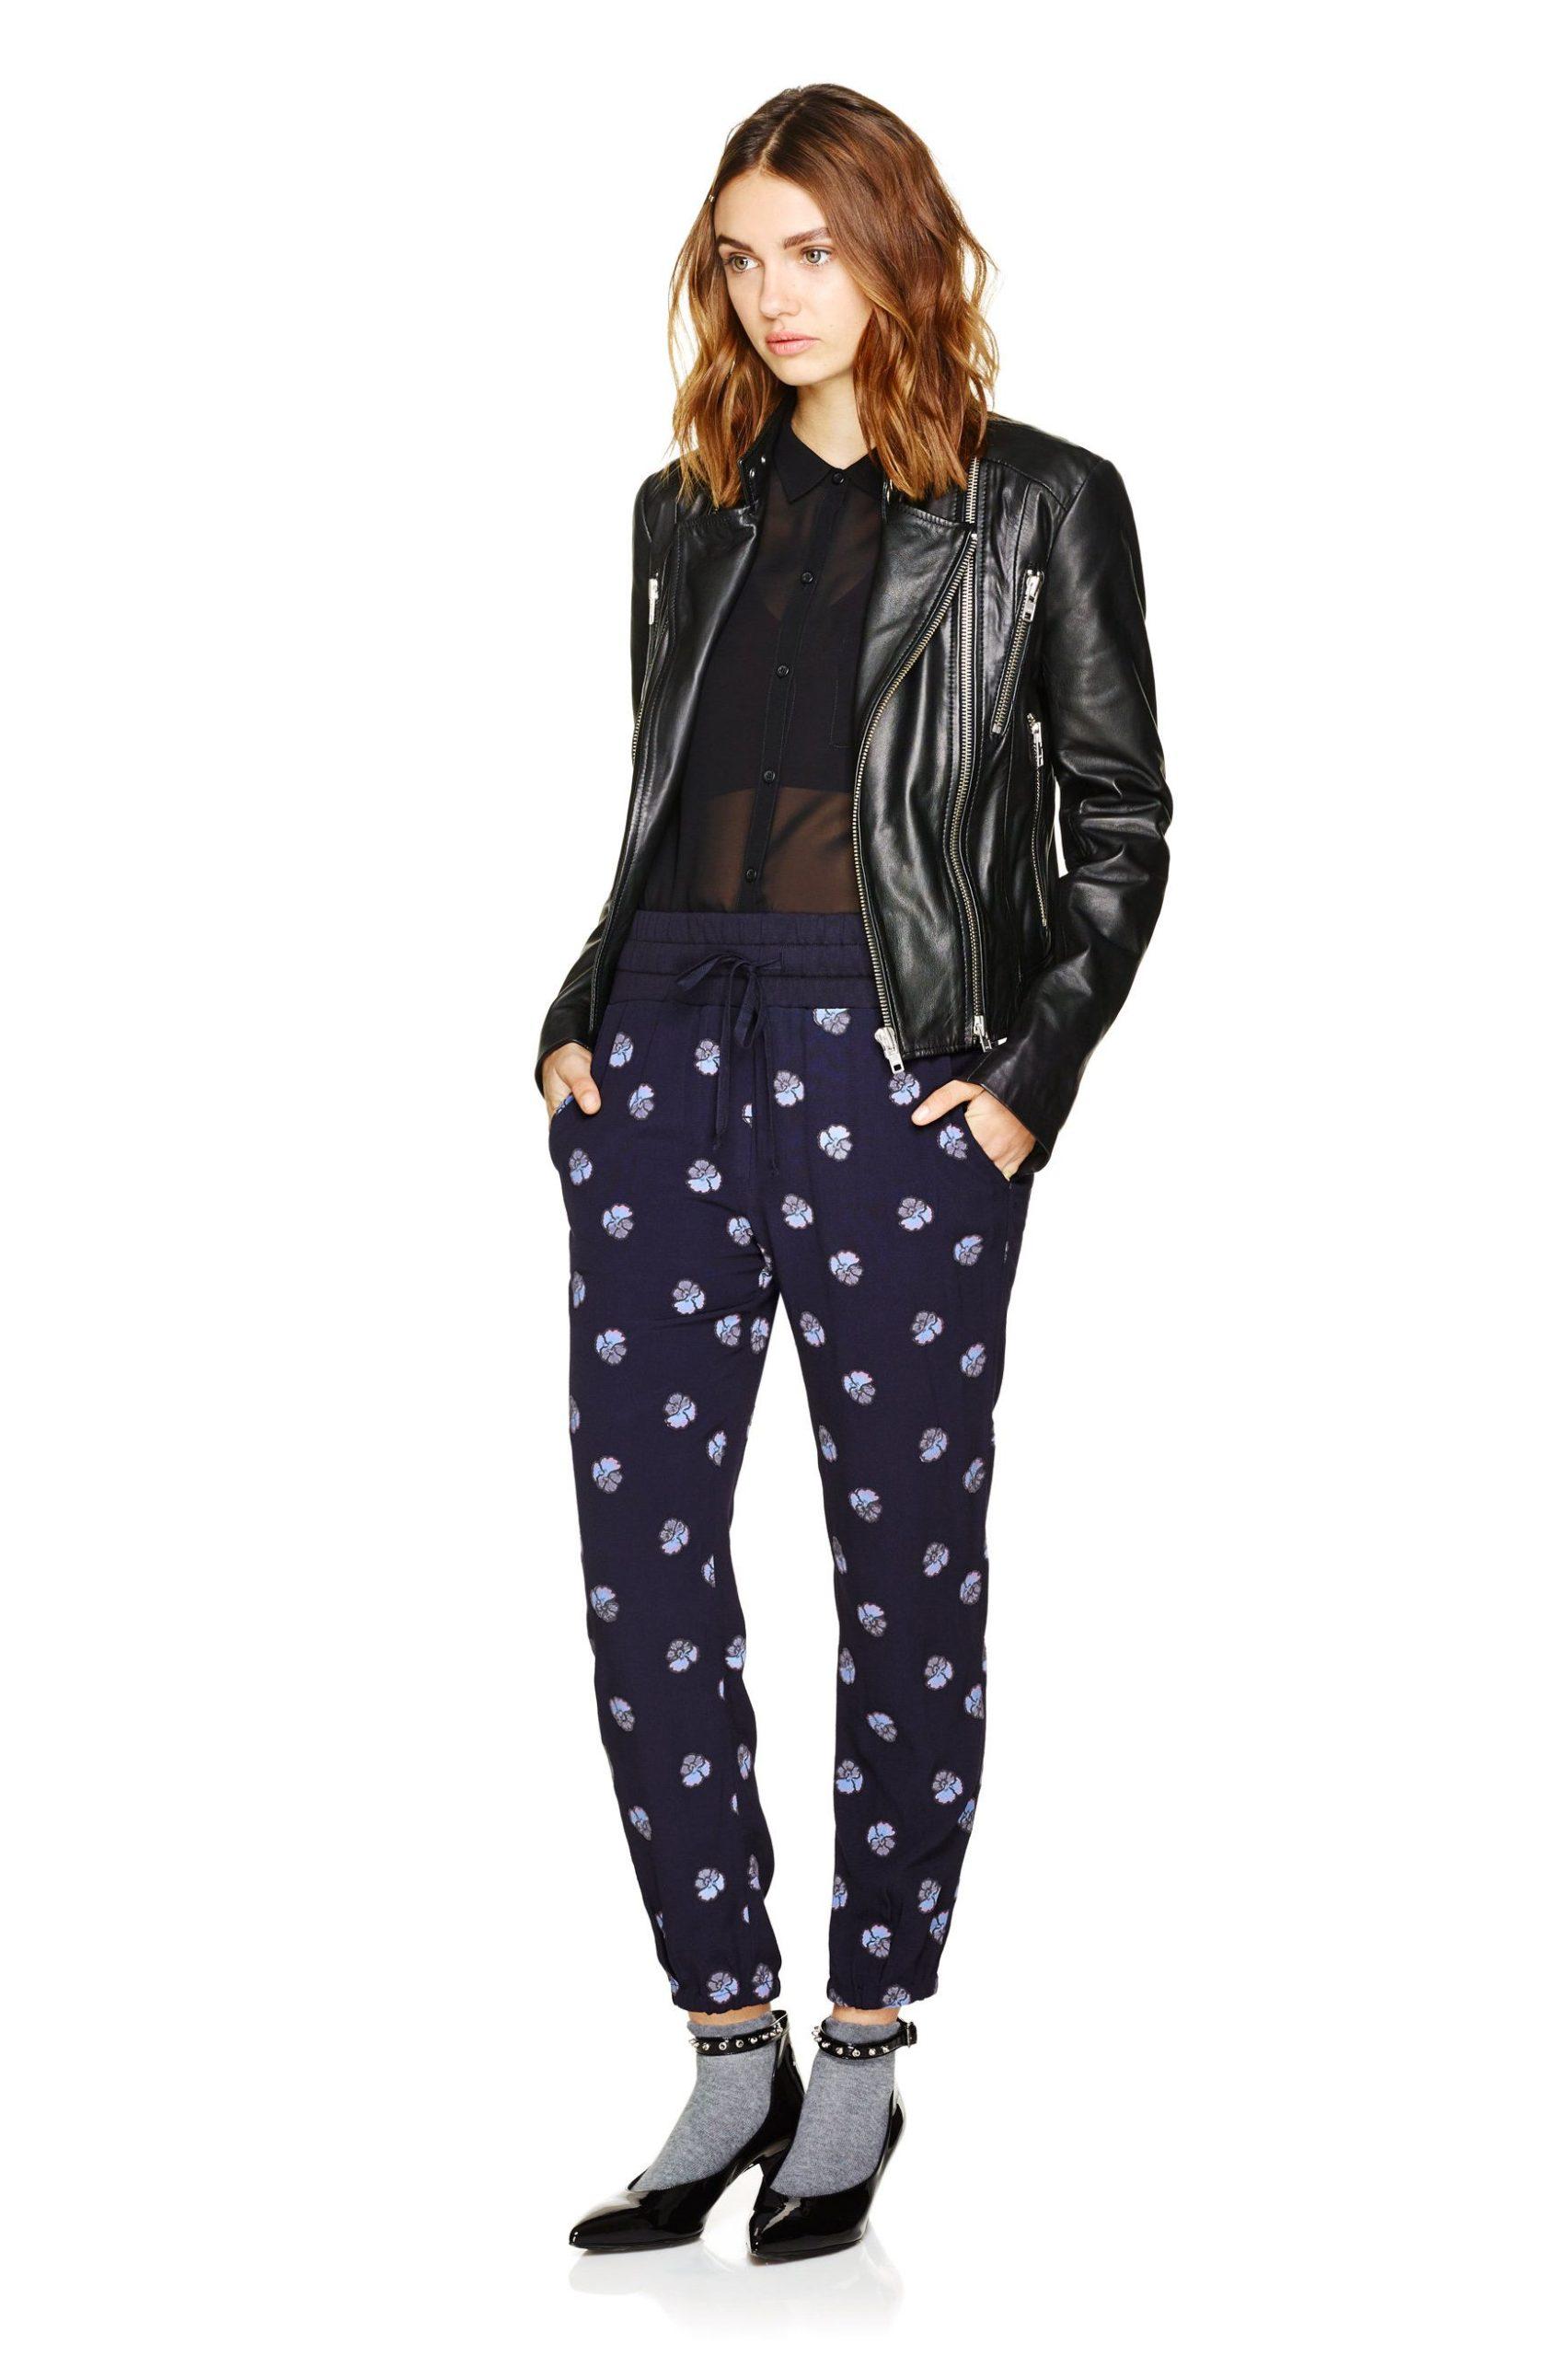 Women Patterned Pants